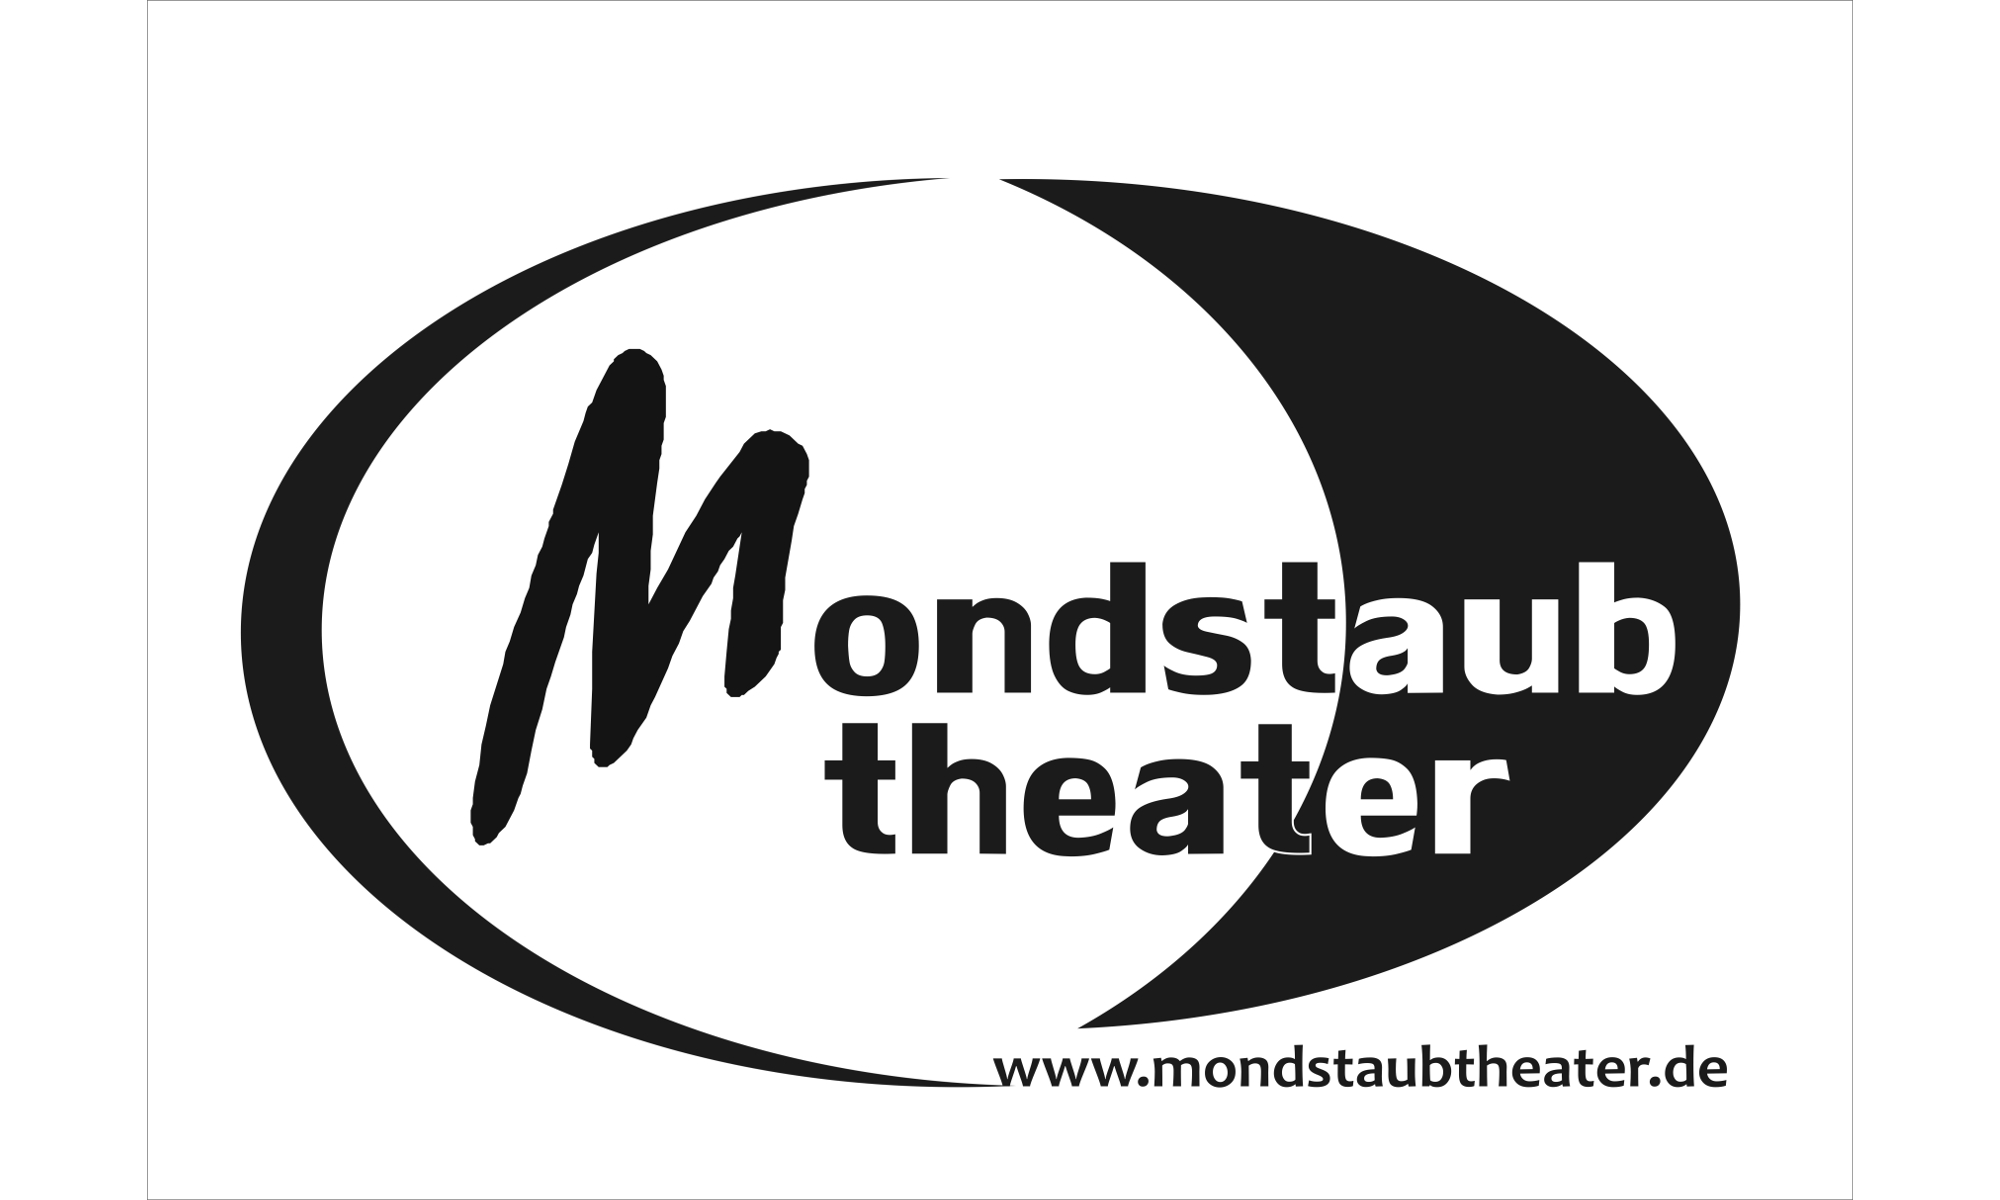 Logo Mondstaubtheater